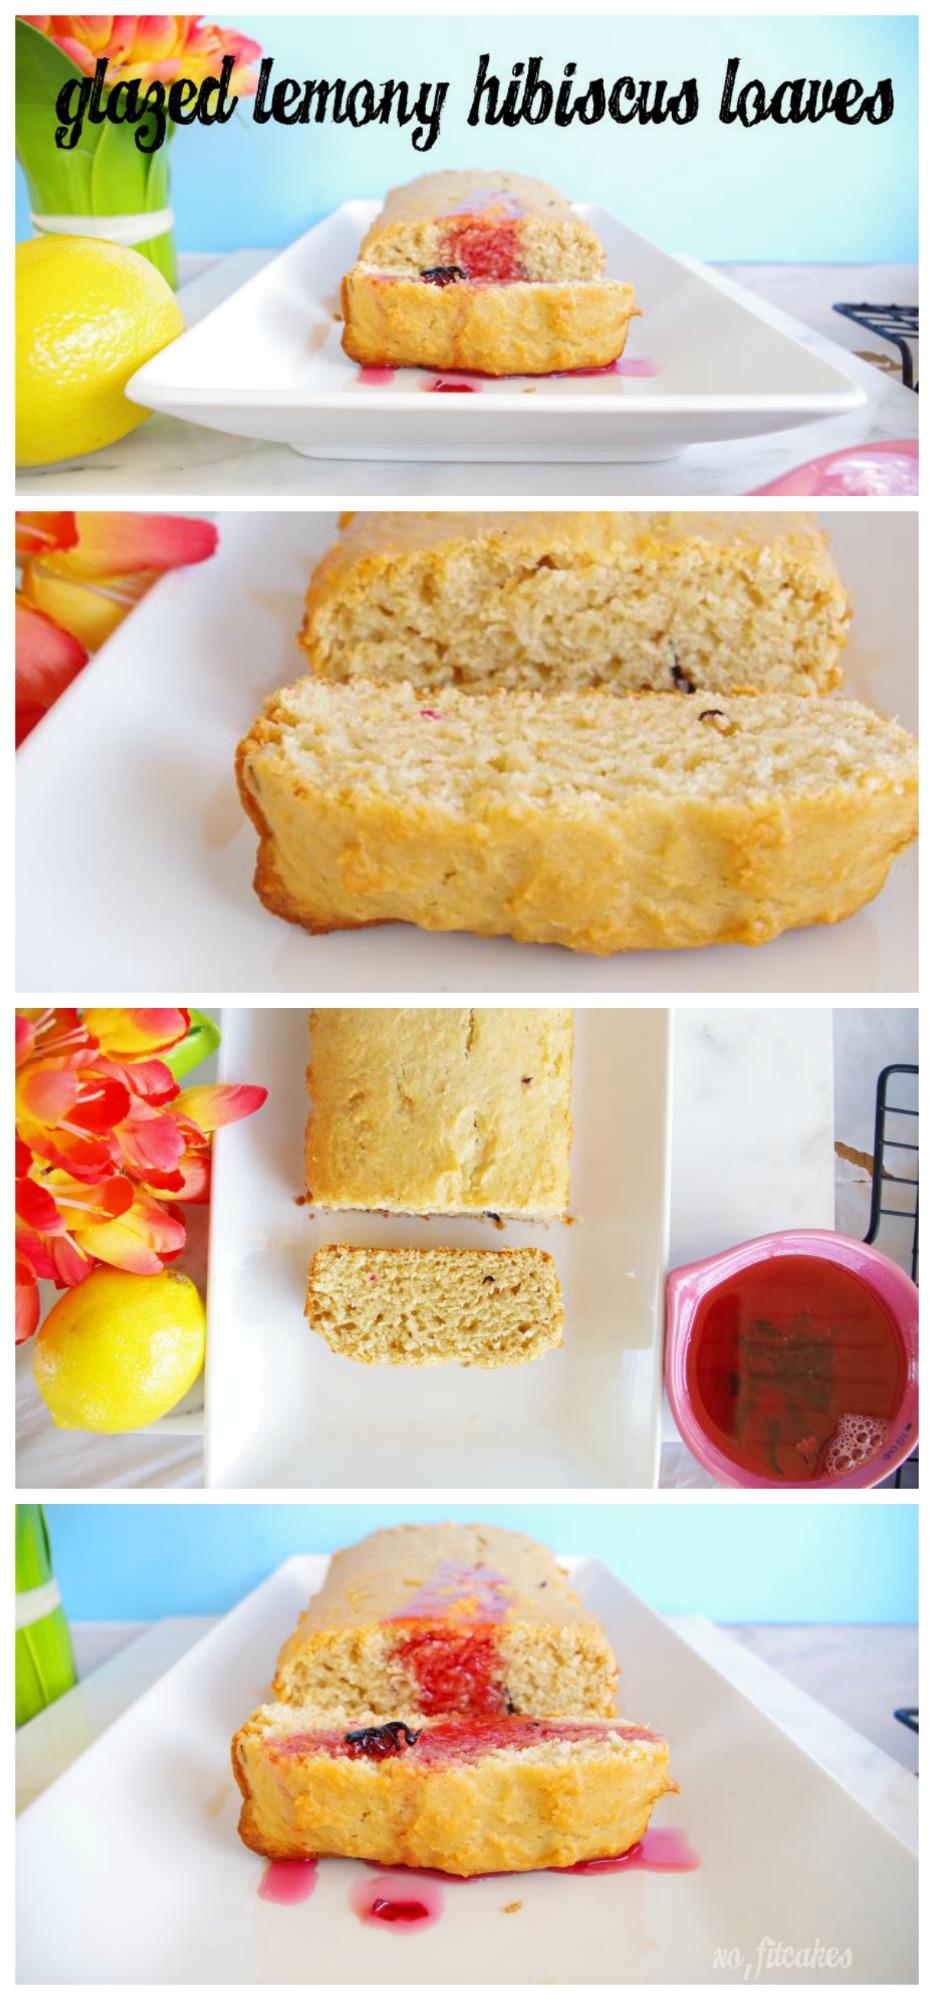 Glazed Lemony Hibiscus Yogurt Loaves | FitCakery.com